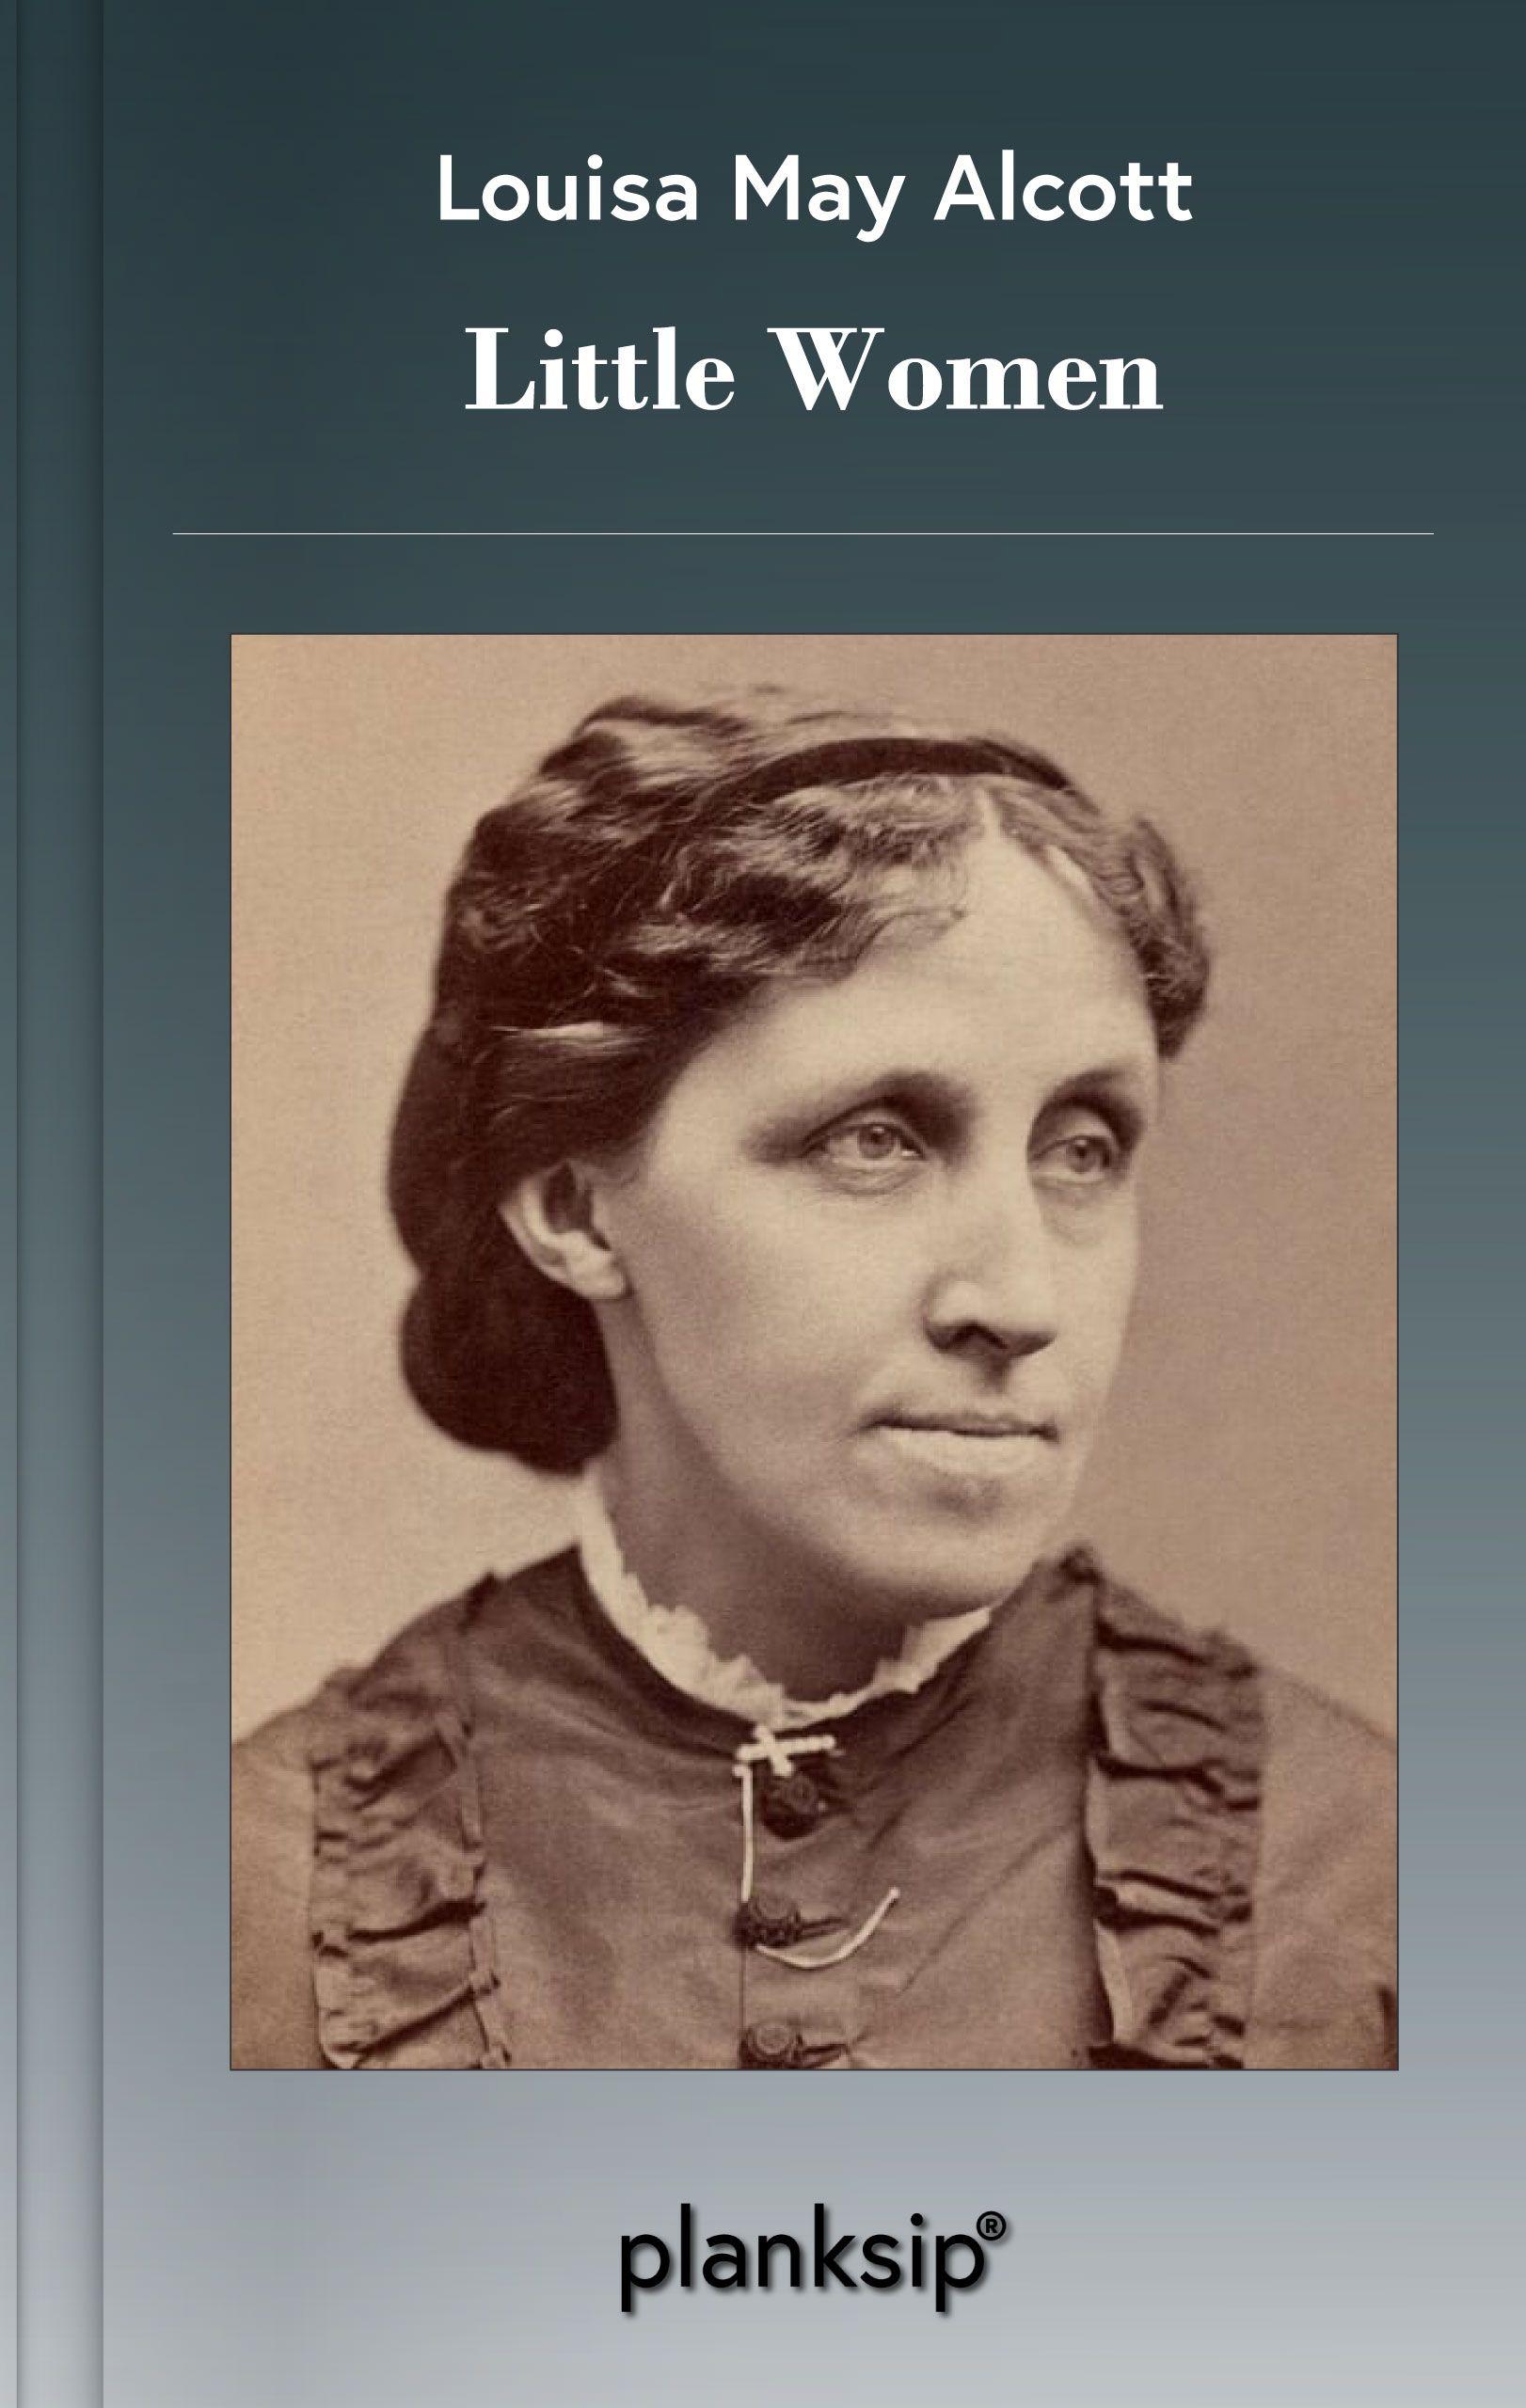 Little Women by Louisa May Alcott (1832-1888). Published by planksip